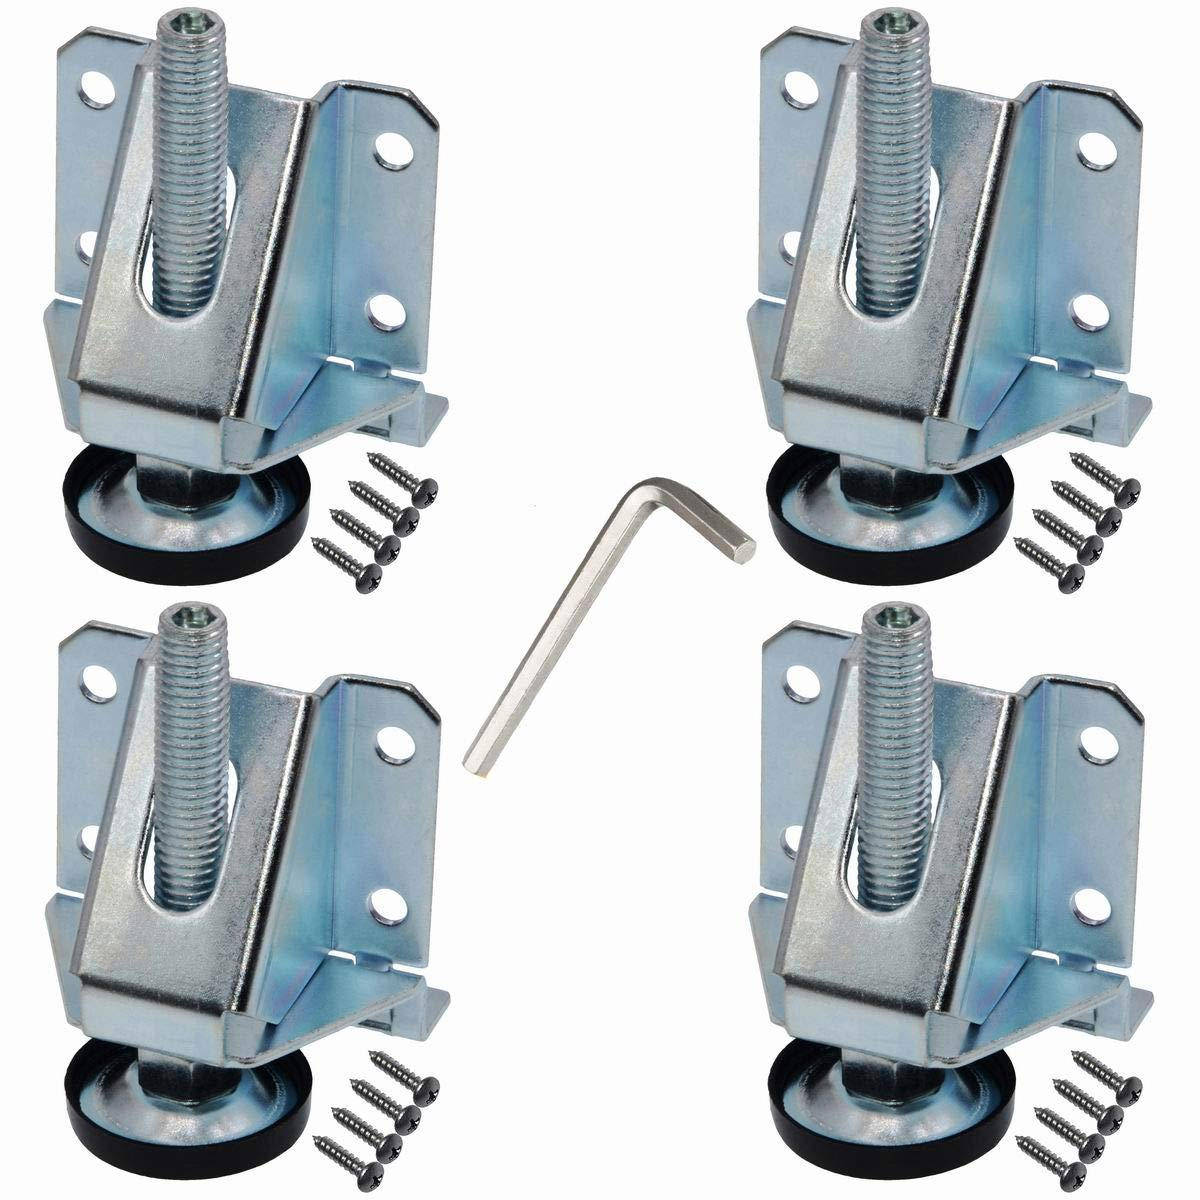 2 inch Height Adjustable Heavy Duty Furniture Legs Leveler Hexagon Nuts Lock (4 Pack)